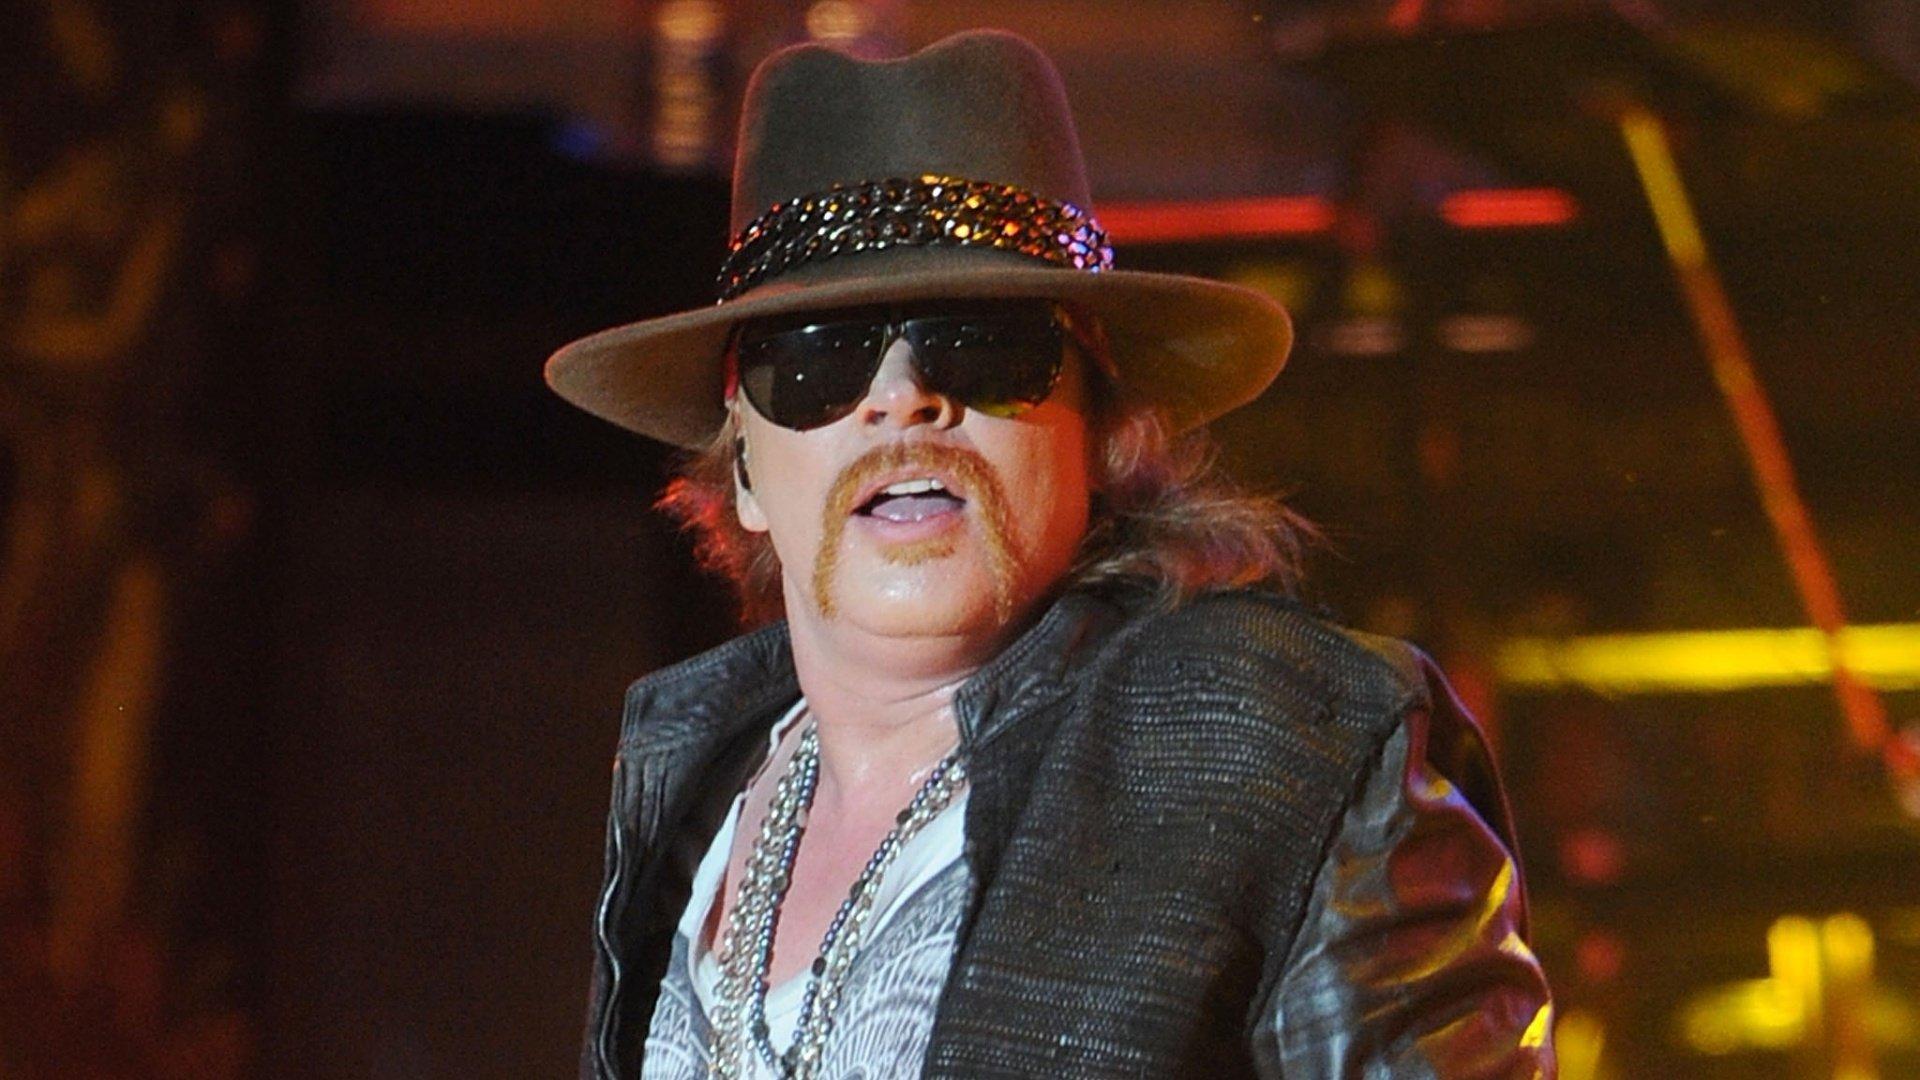 Axl-Rose-To-Confirm-Guns-N'-Roses-Reunion-Shows